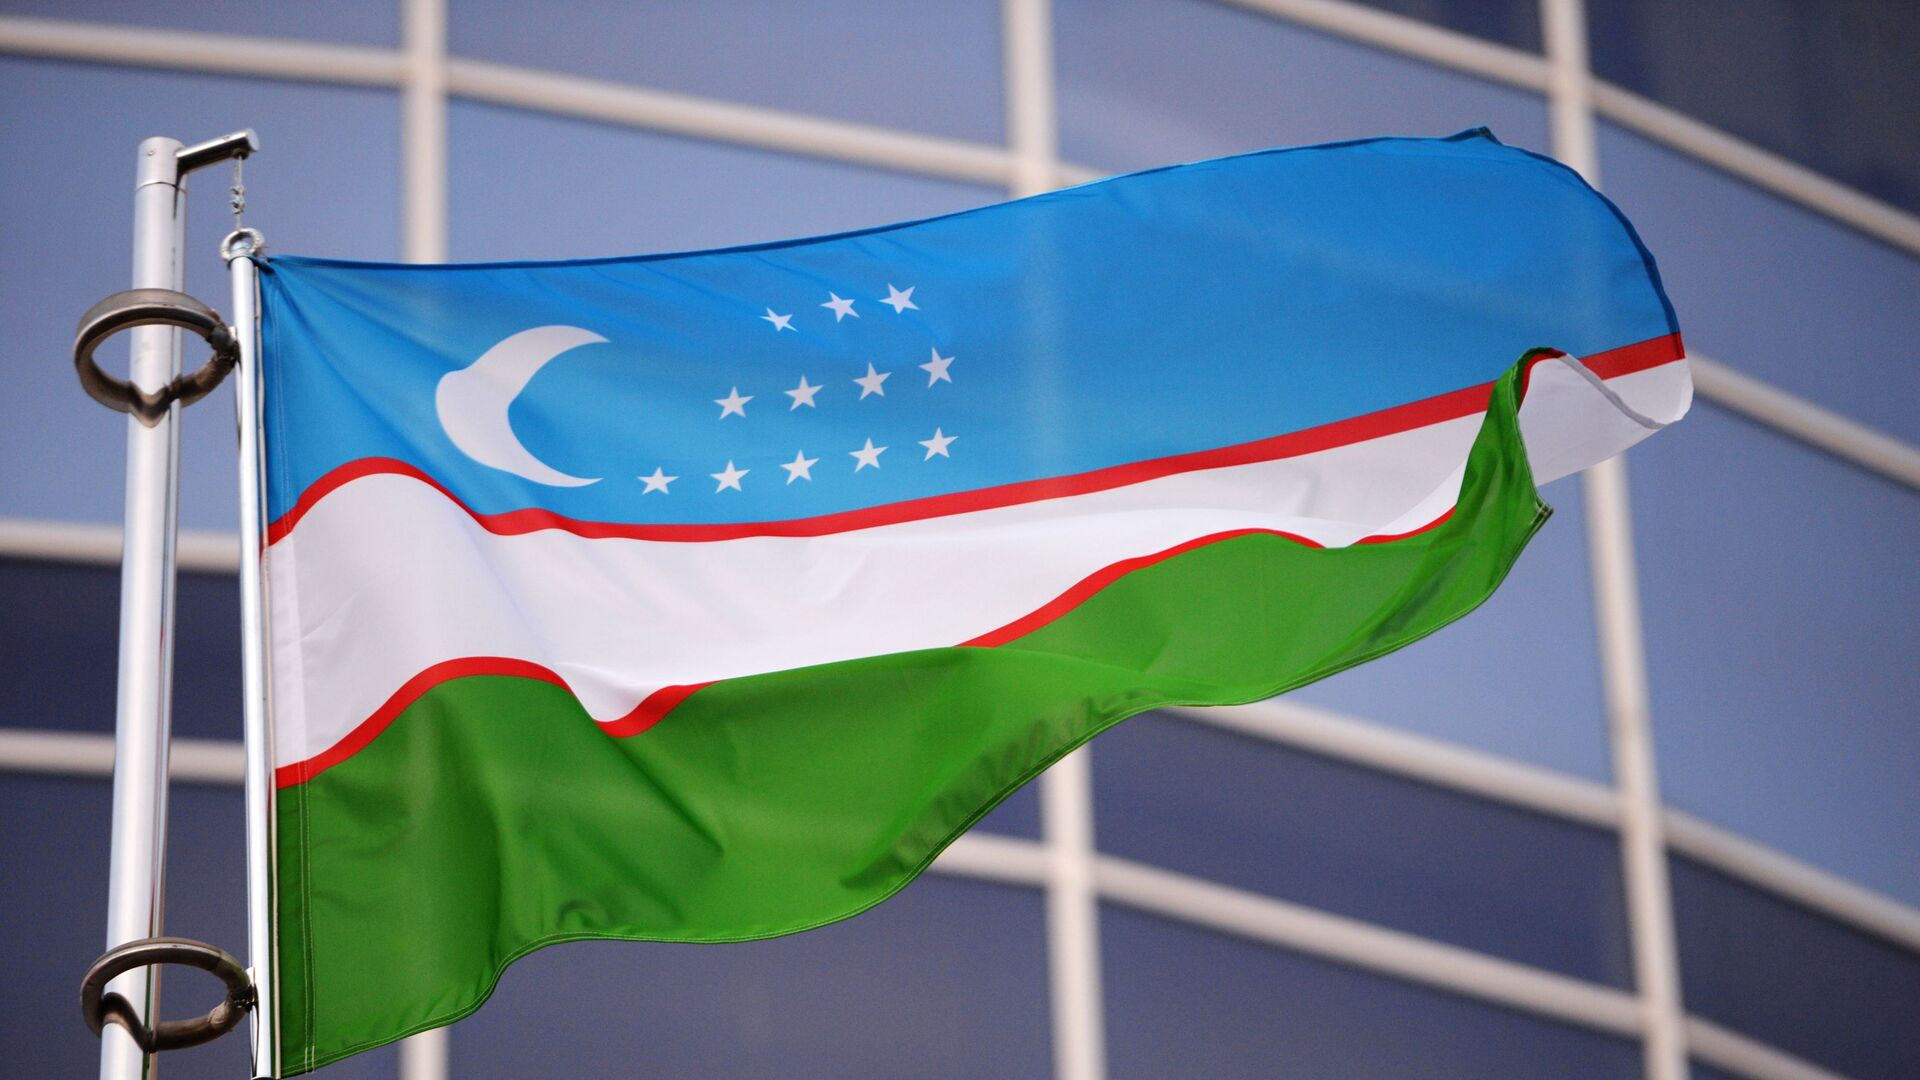 Государственный флаг Узбекистана - Sputnik Беларусь, 1920, 01.07.2021